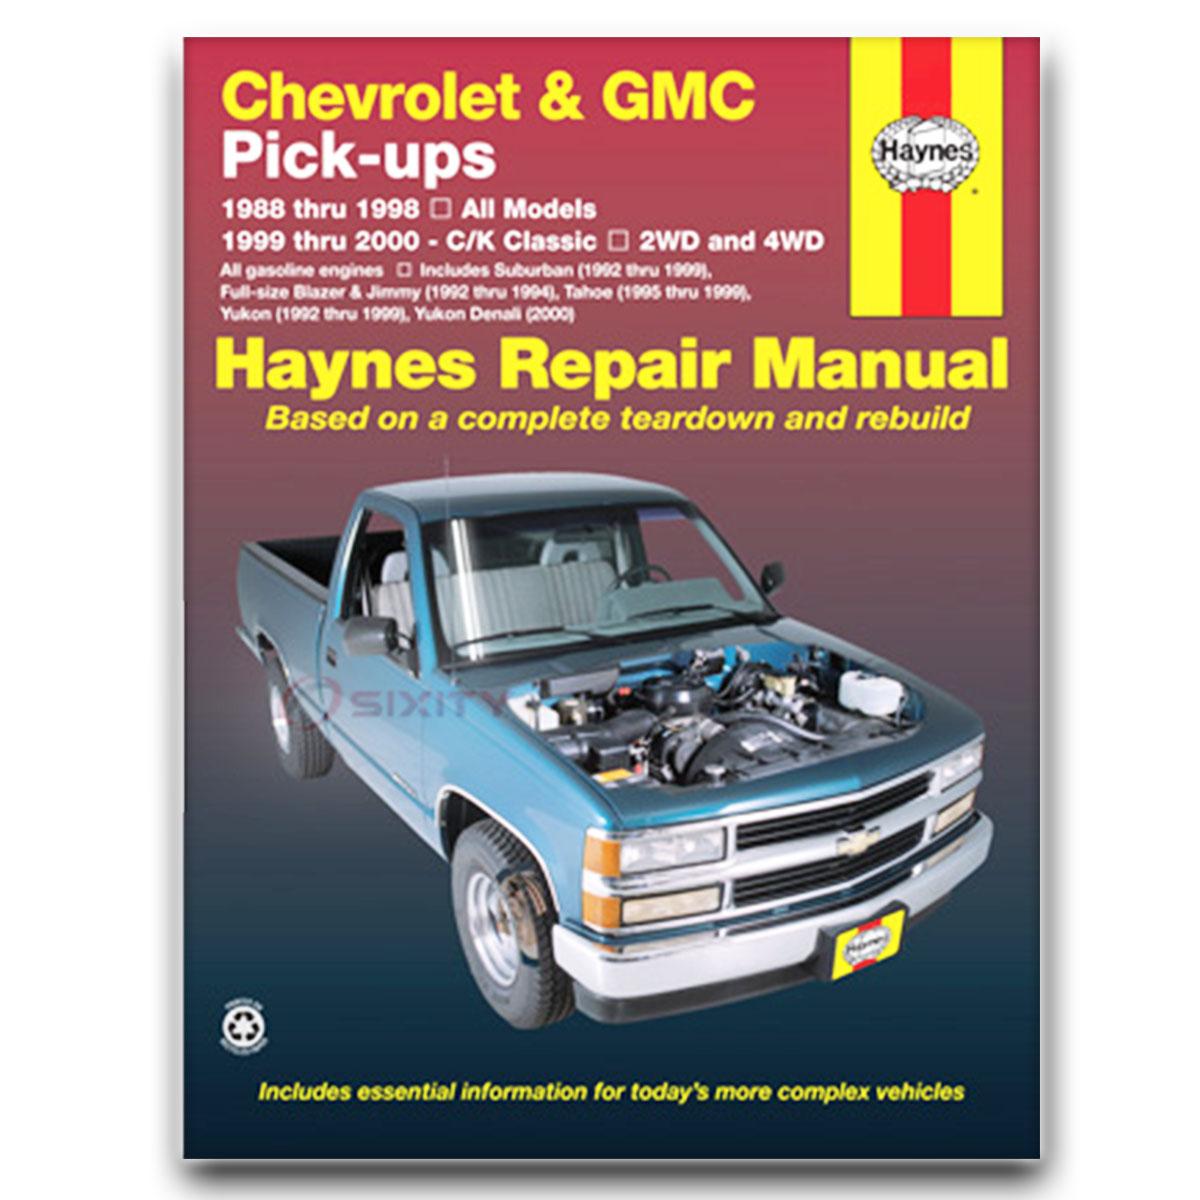 Haynes Repair Manual for GMC K2500 Sierra SLE SLX SLT Shop Service Garage hb